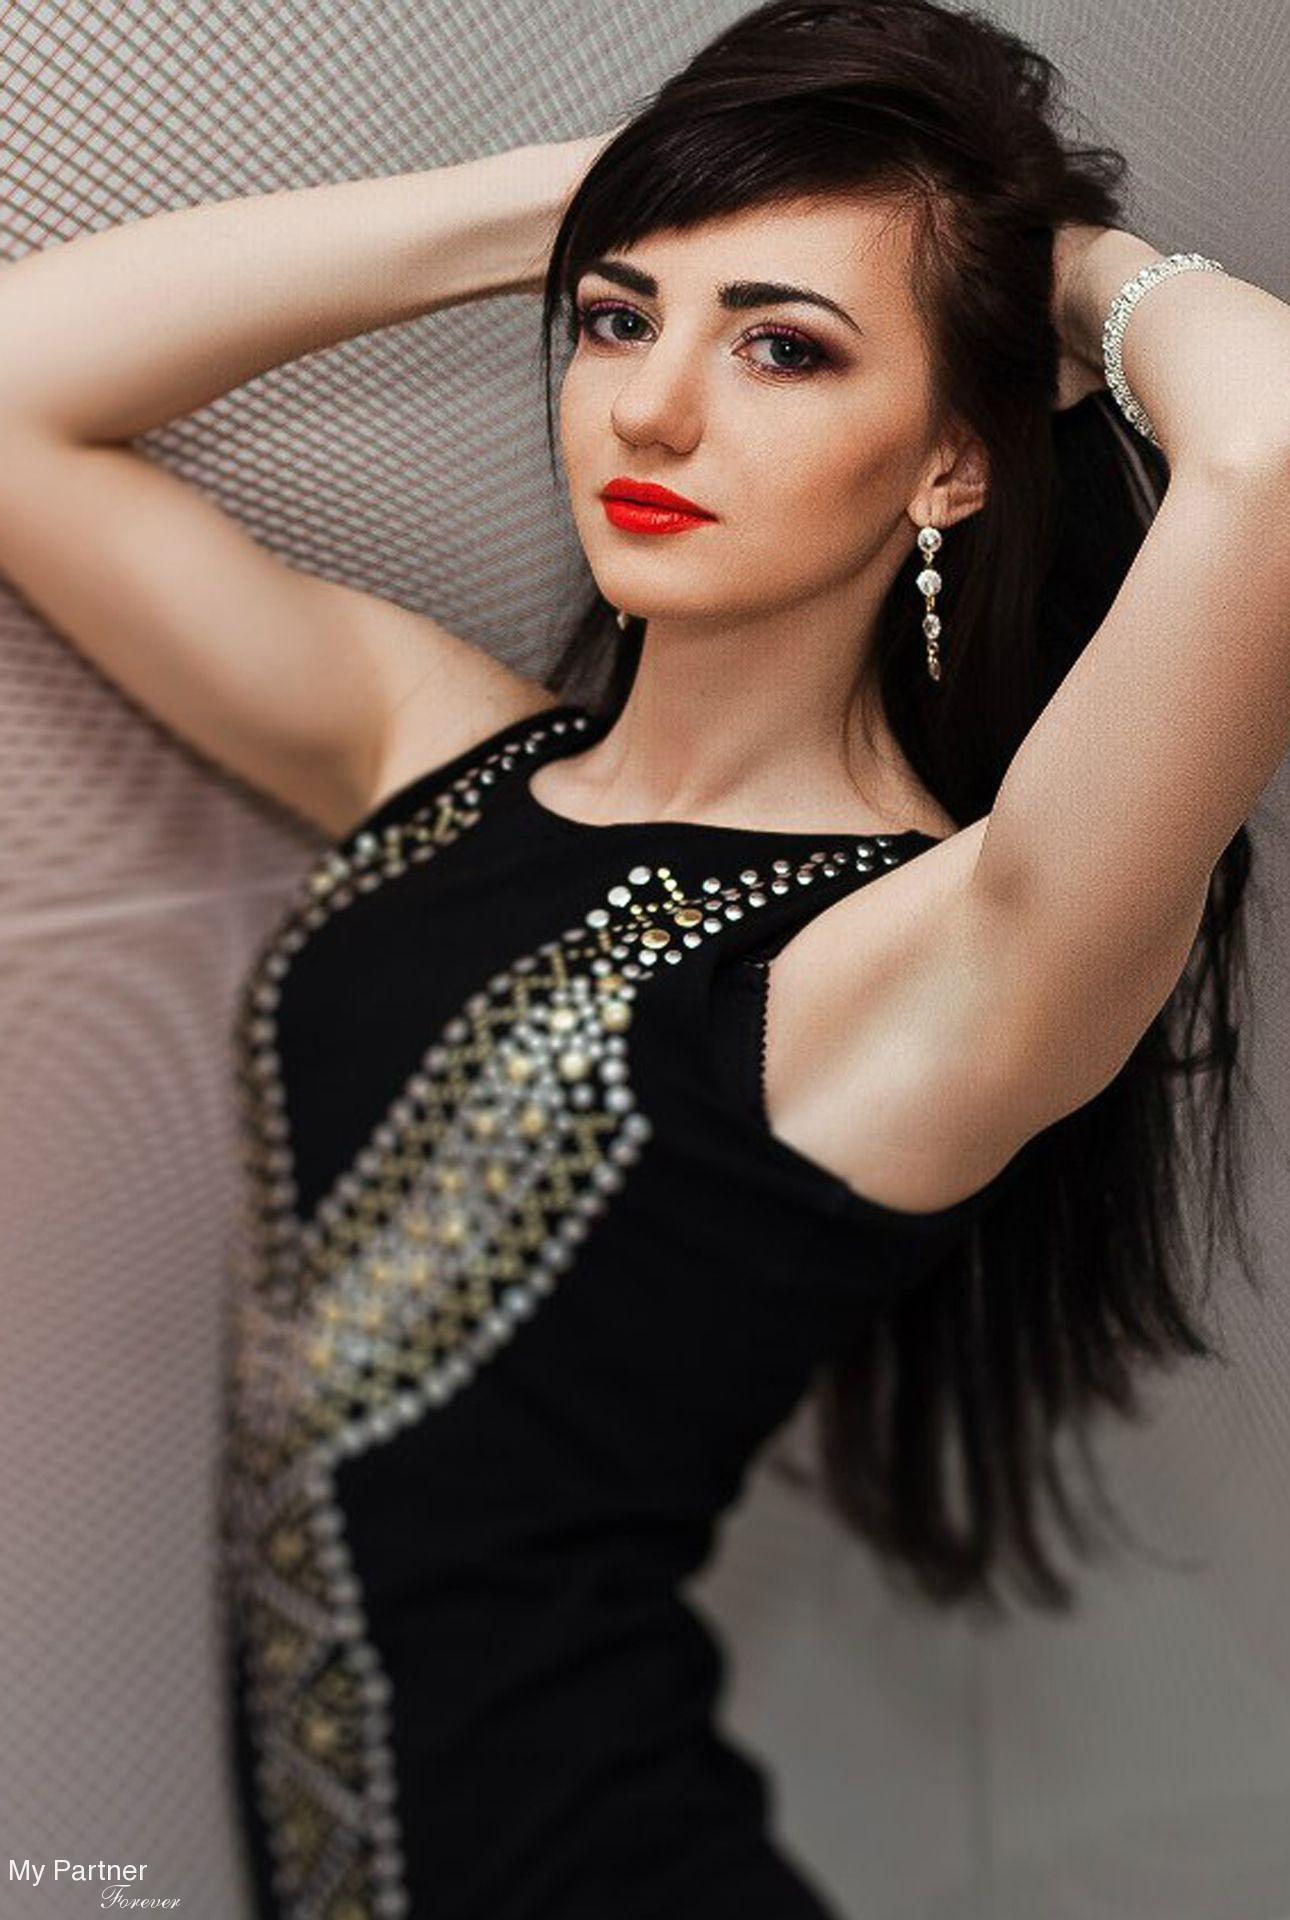 Agence matrimoniale rencontre femme russe